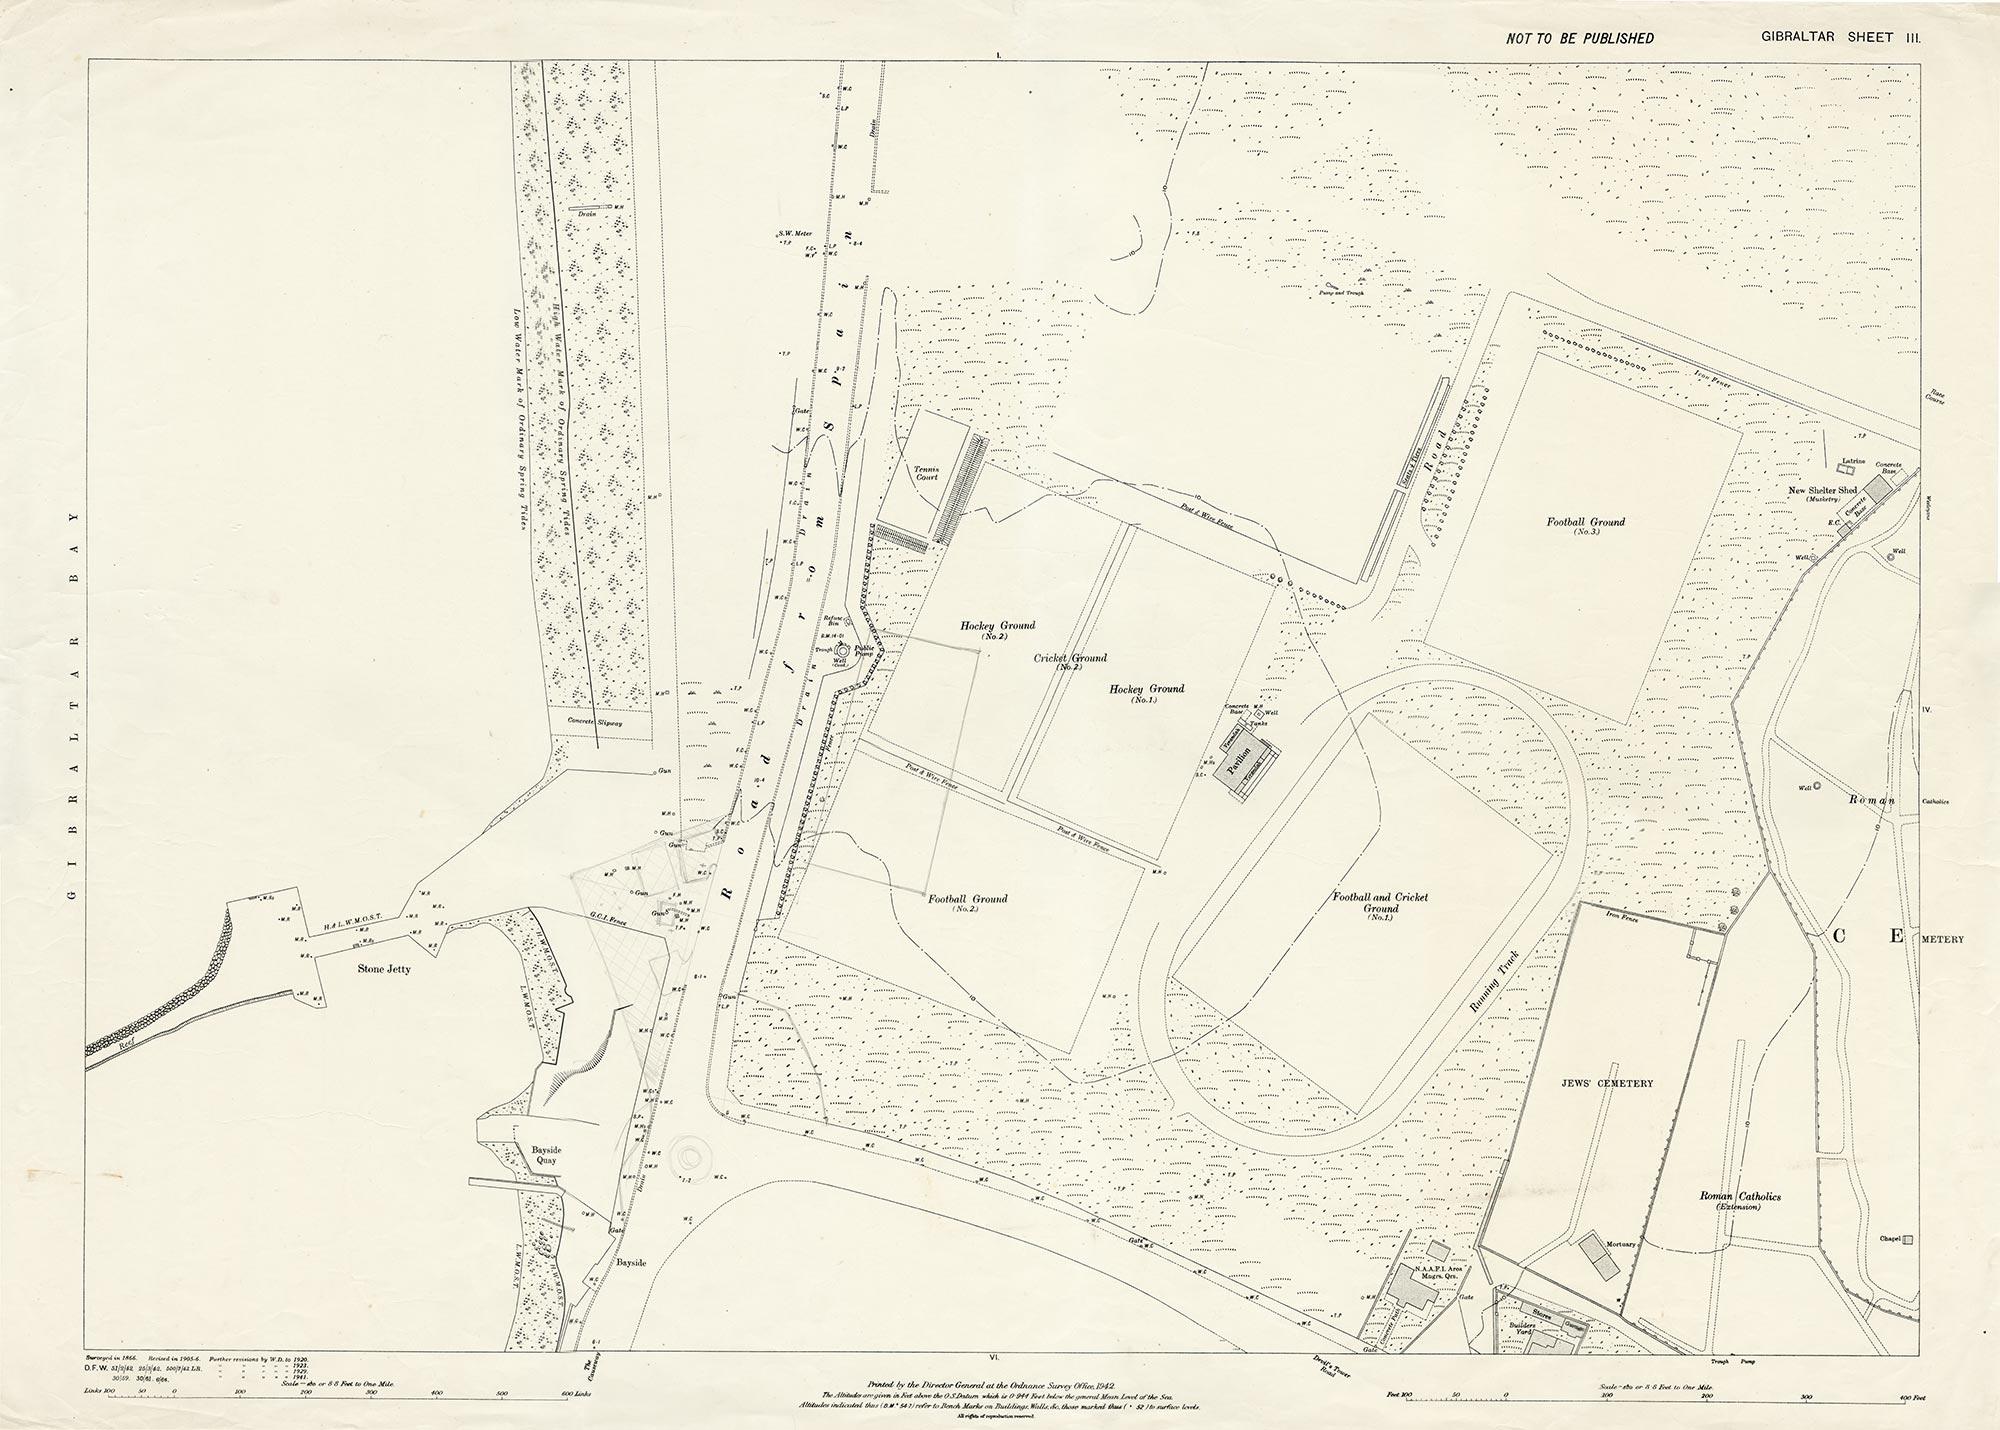 Map 1 Gibraltar Sheet 3 1942 Sundial Roundabout